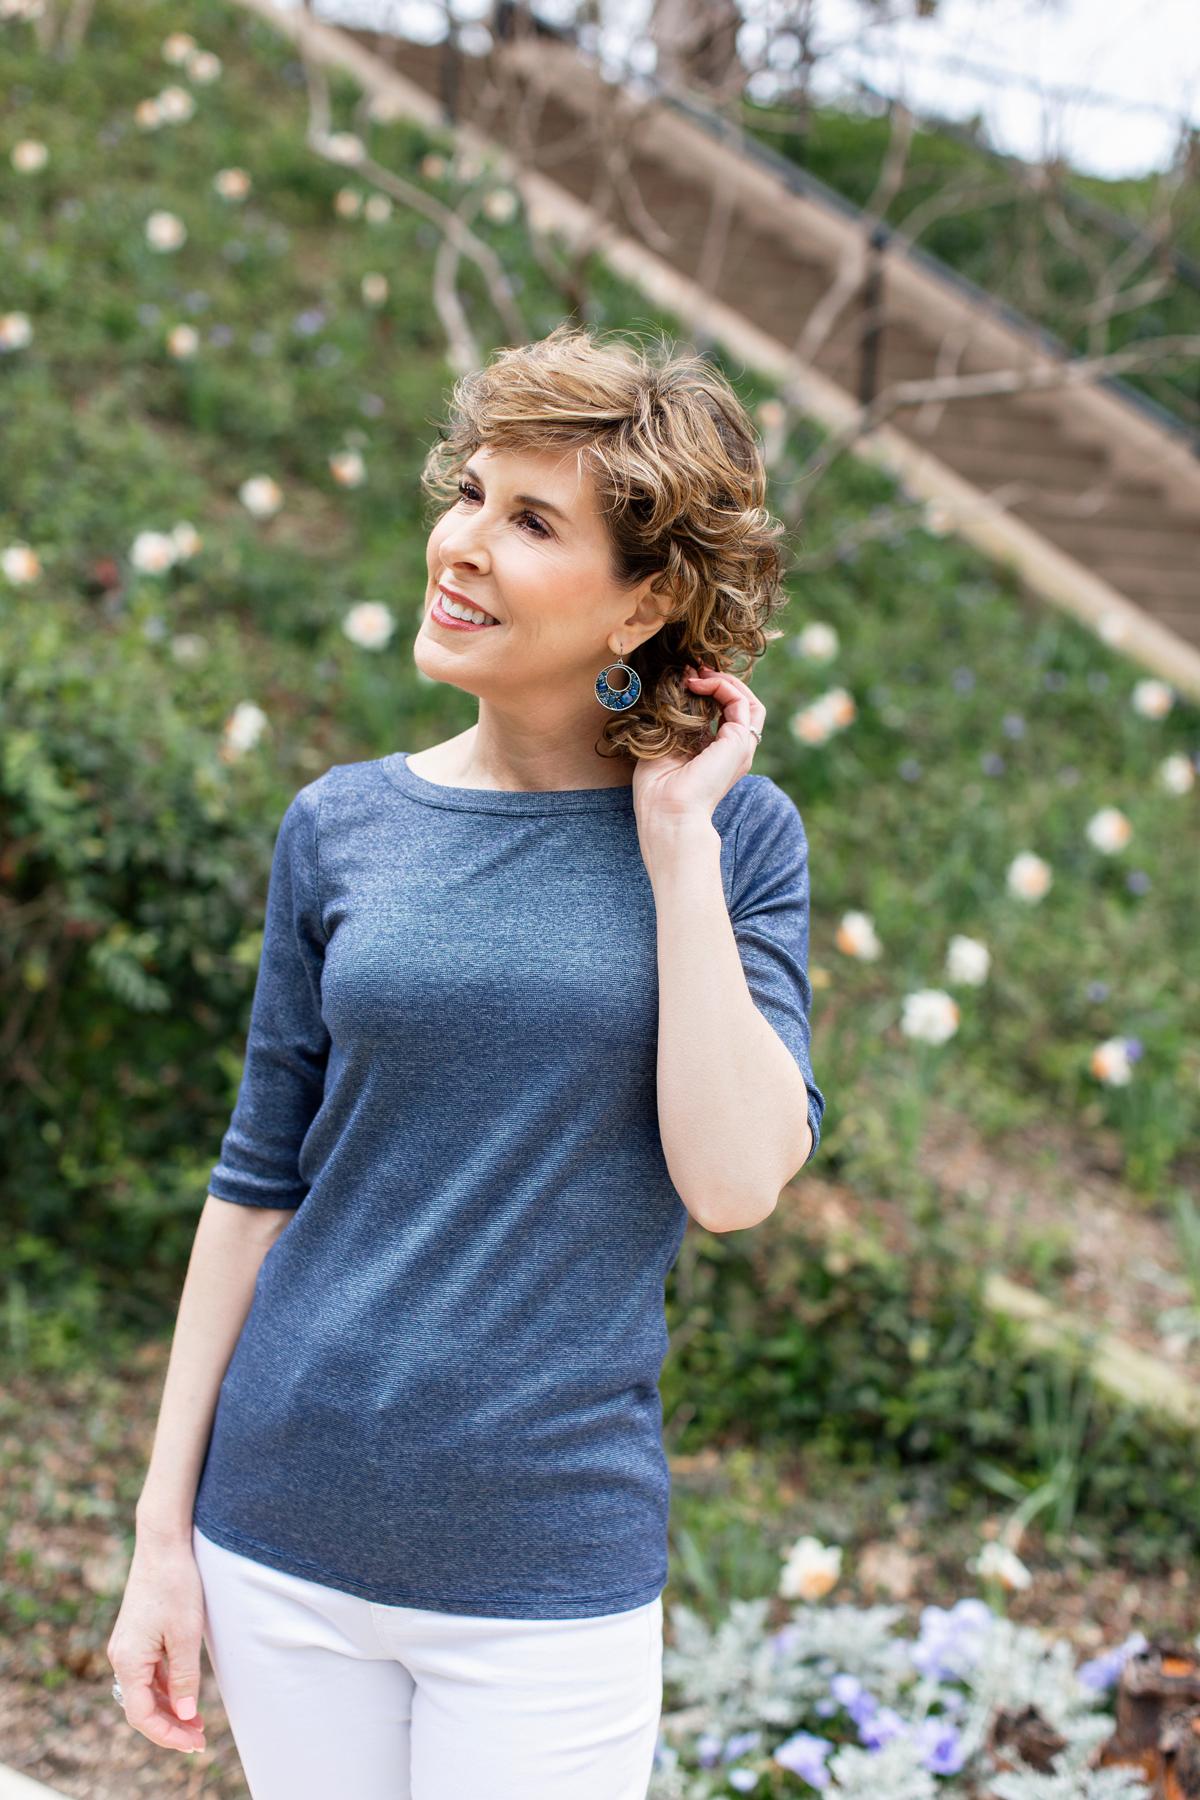 woman in blue tee tucking hair behind her ear